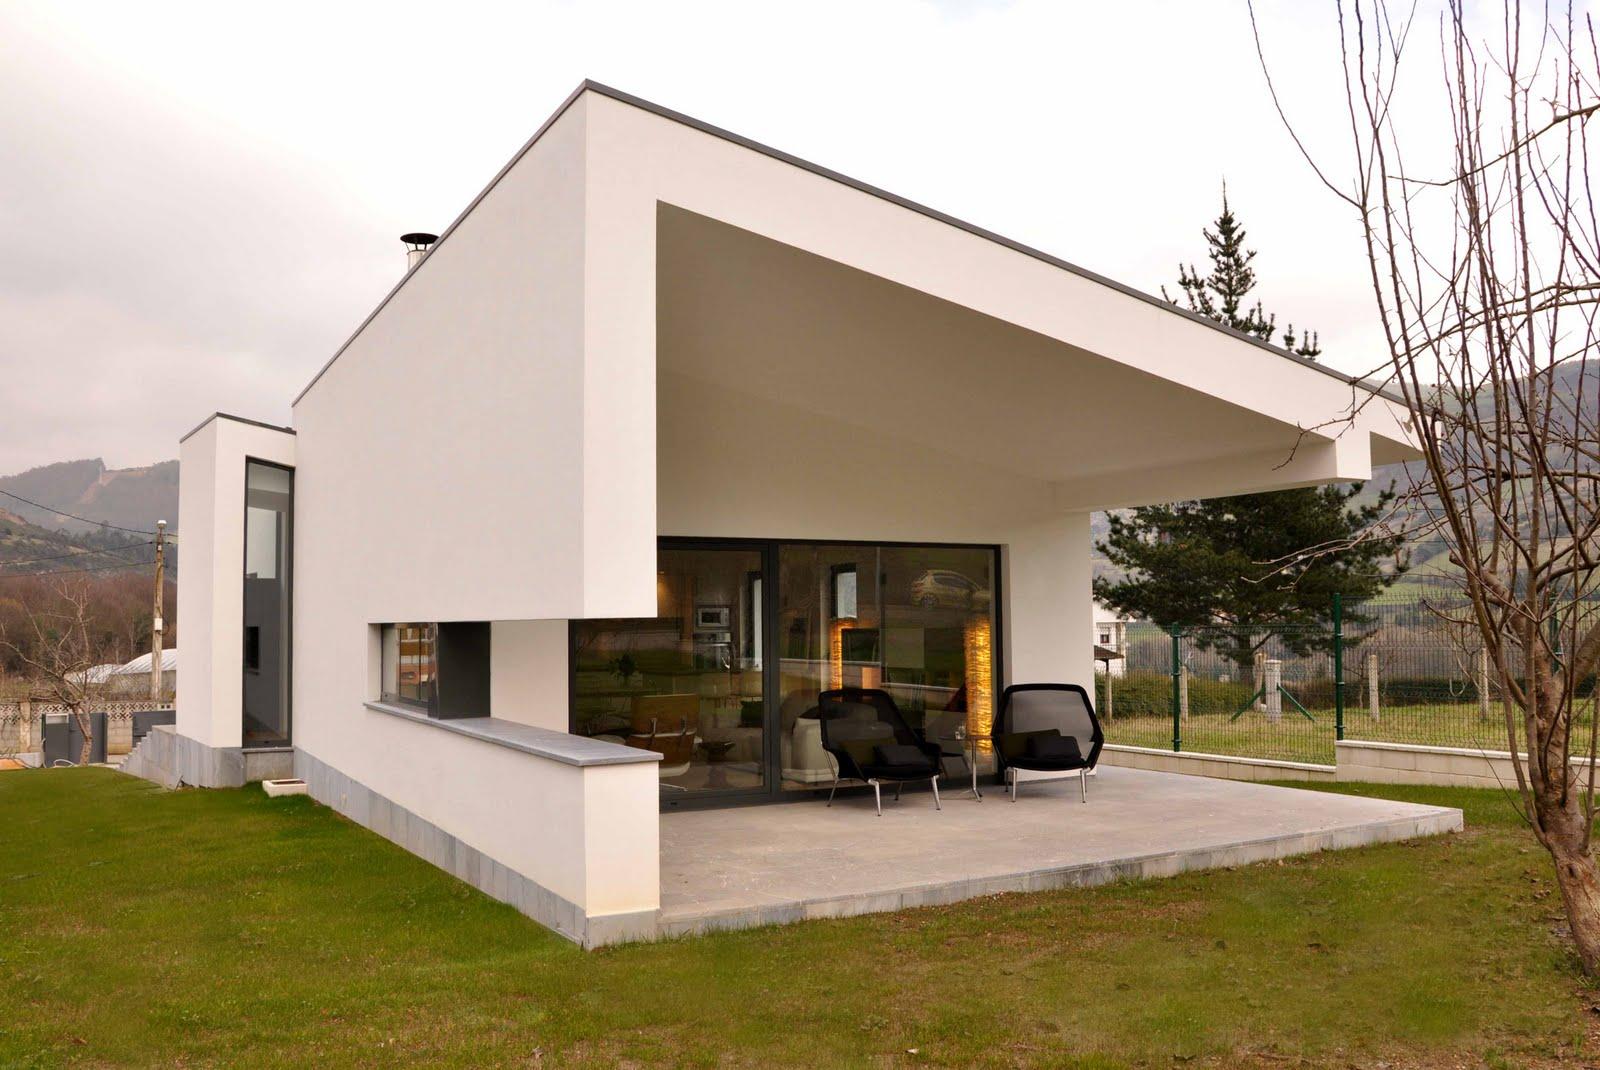 arquitectura arquidea noviembre 2010 On viviendas minimalistas